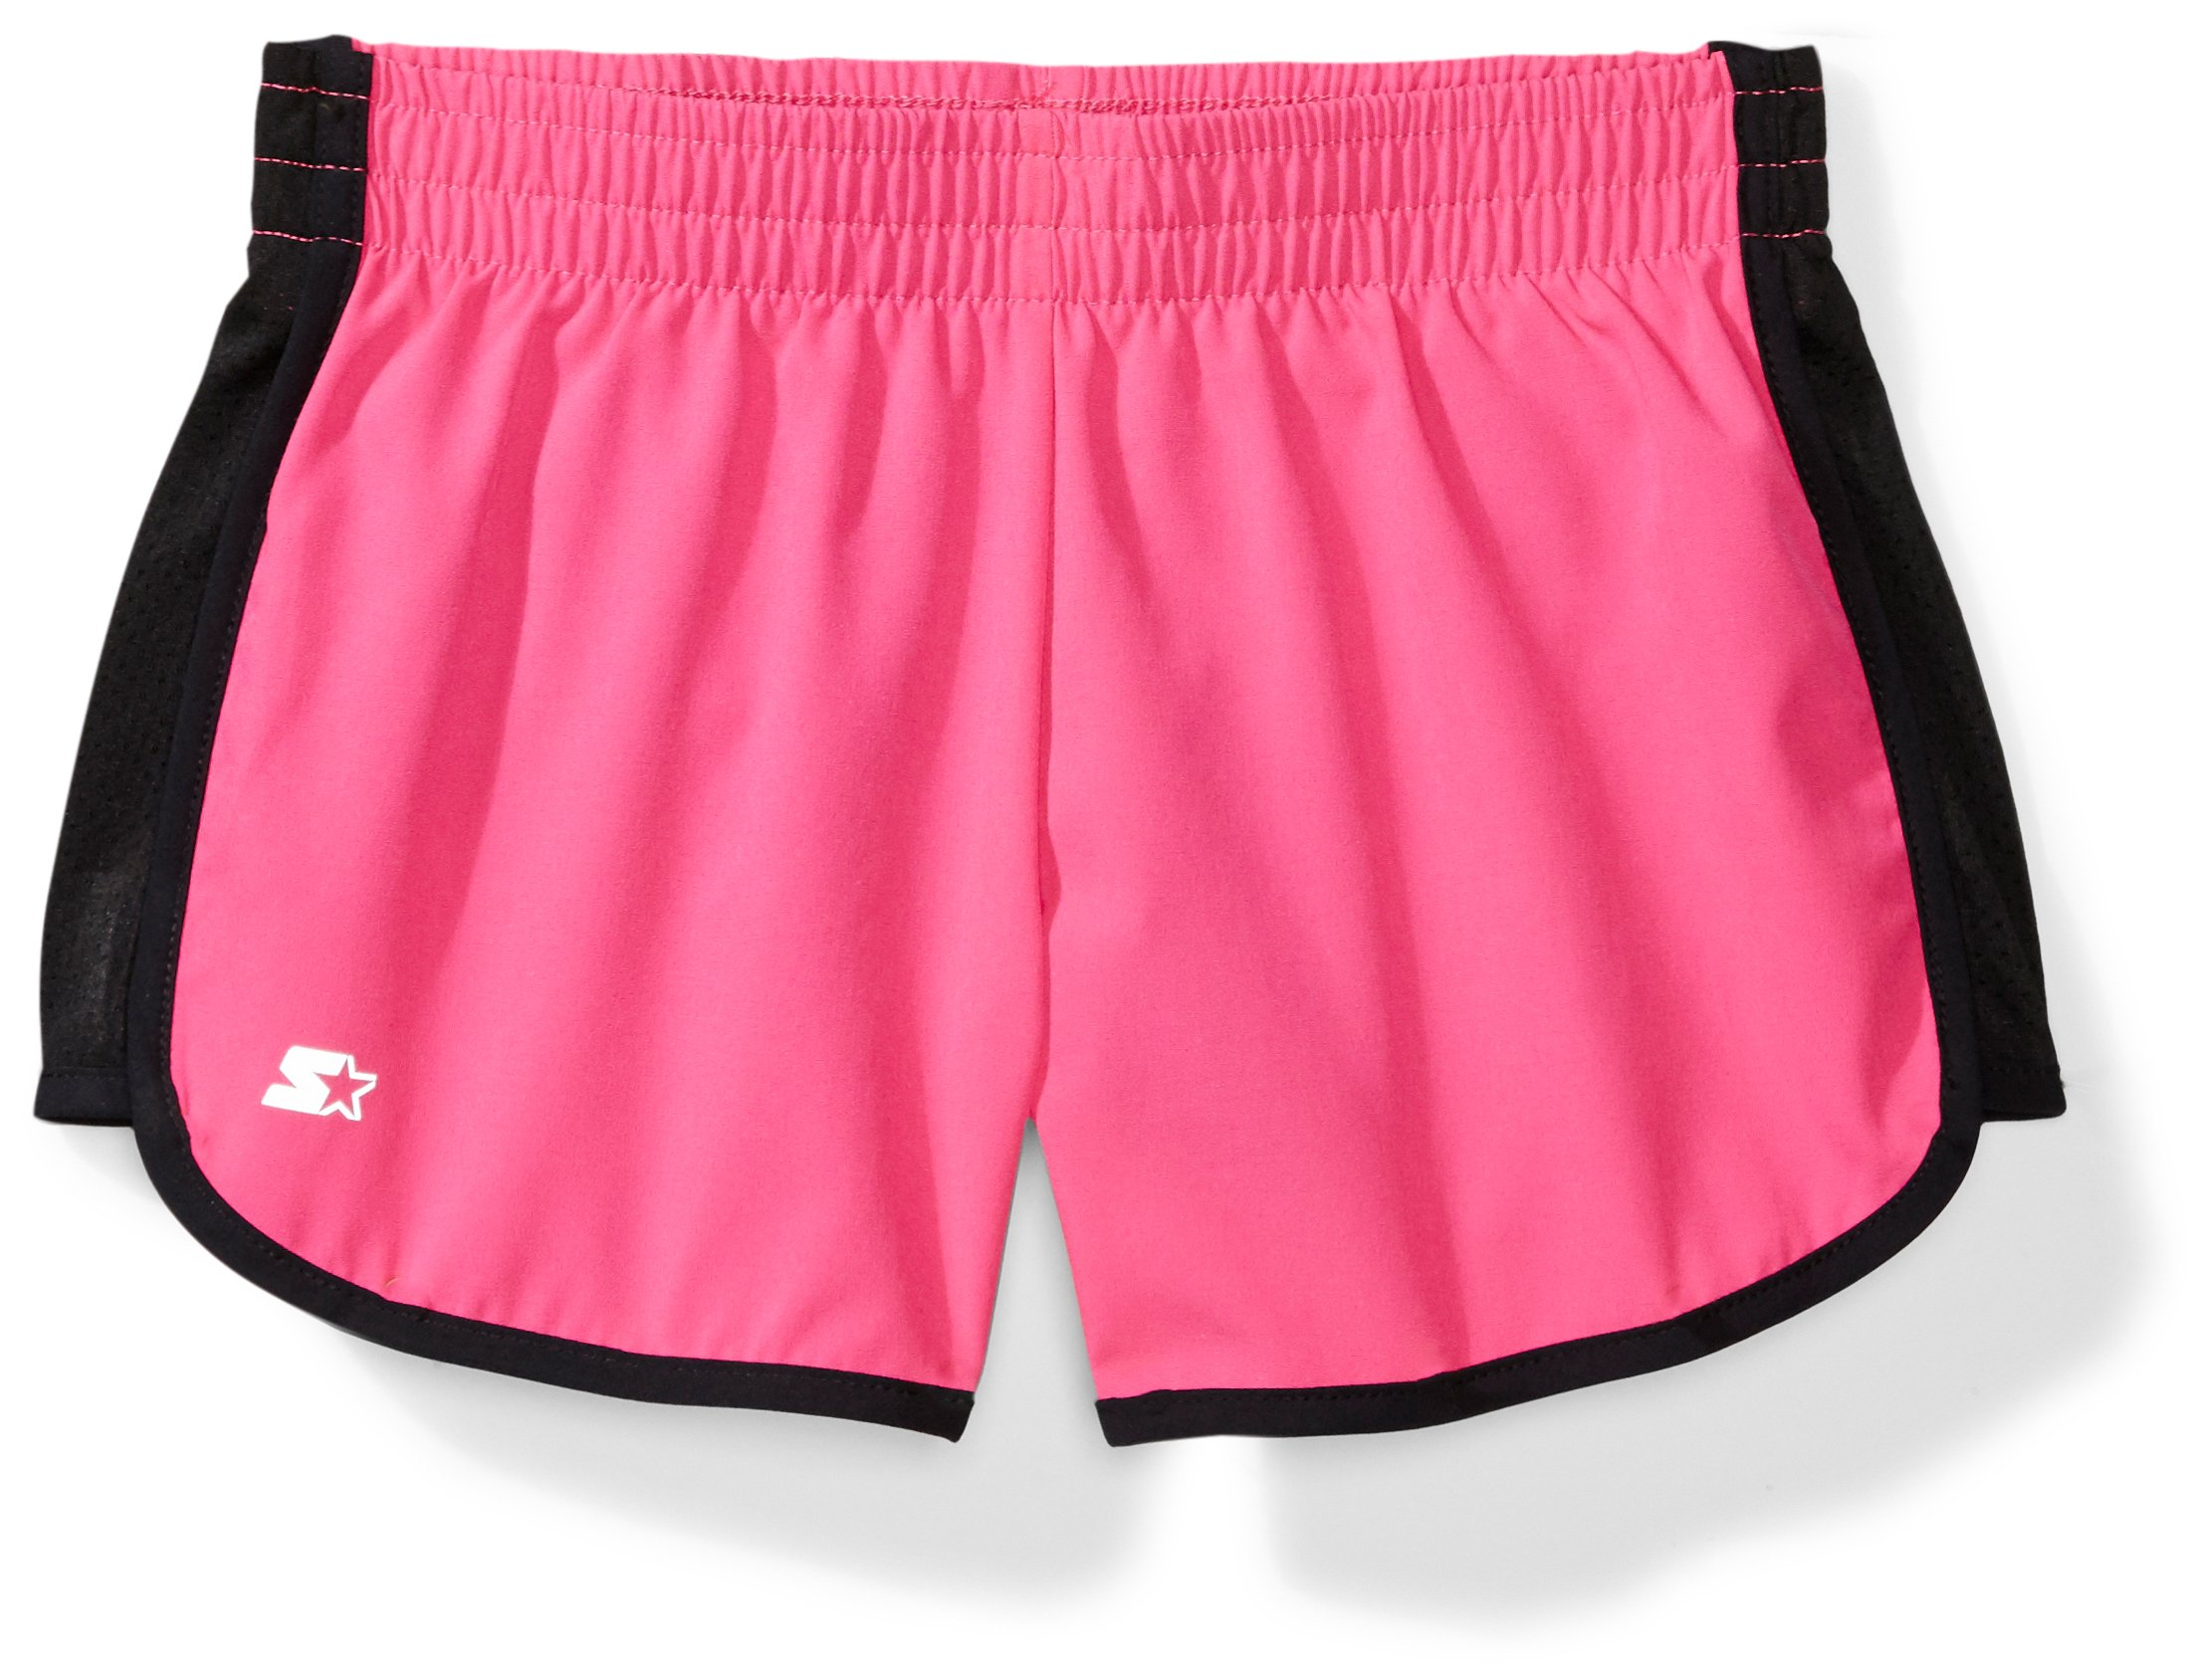 Starter Girls' 3'' Stretch Running Short, Amazon Exclusive, Power Pink with Black, XL (14/16) by Starter